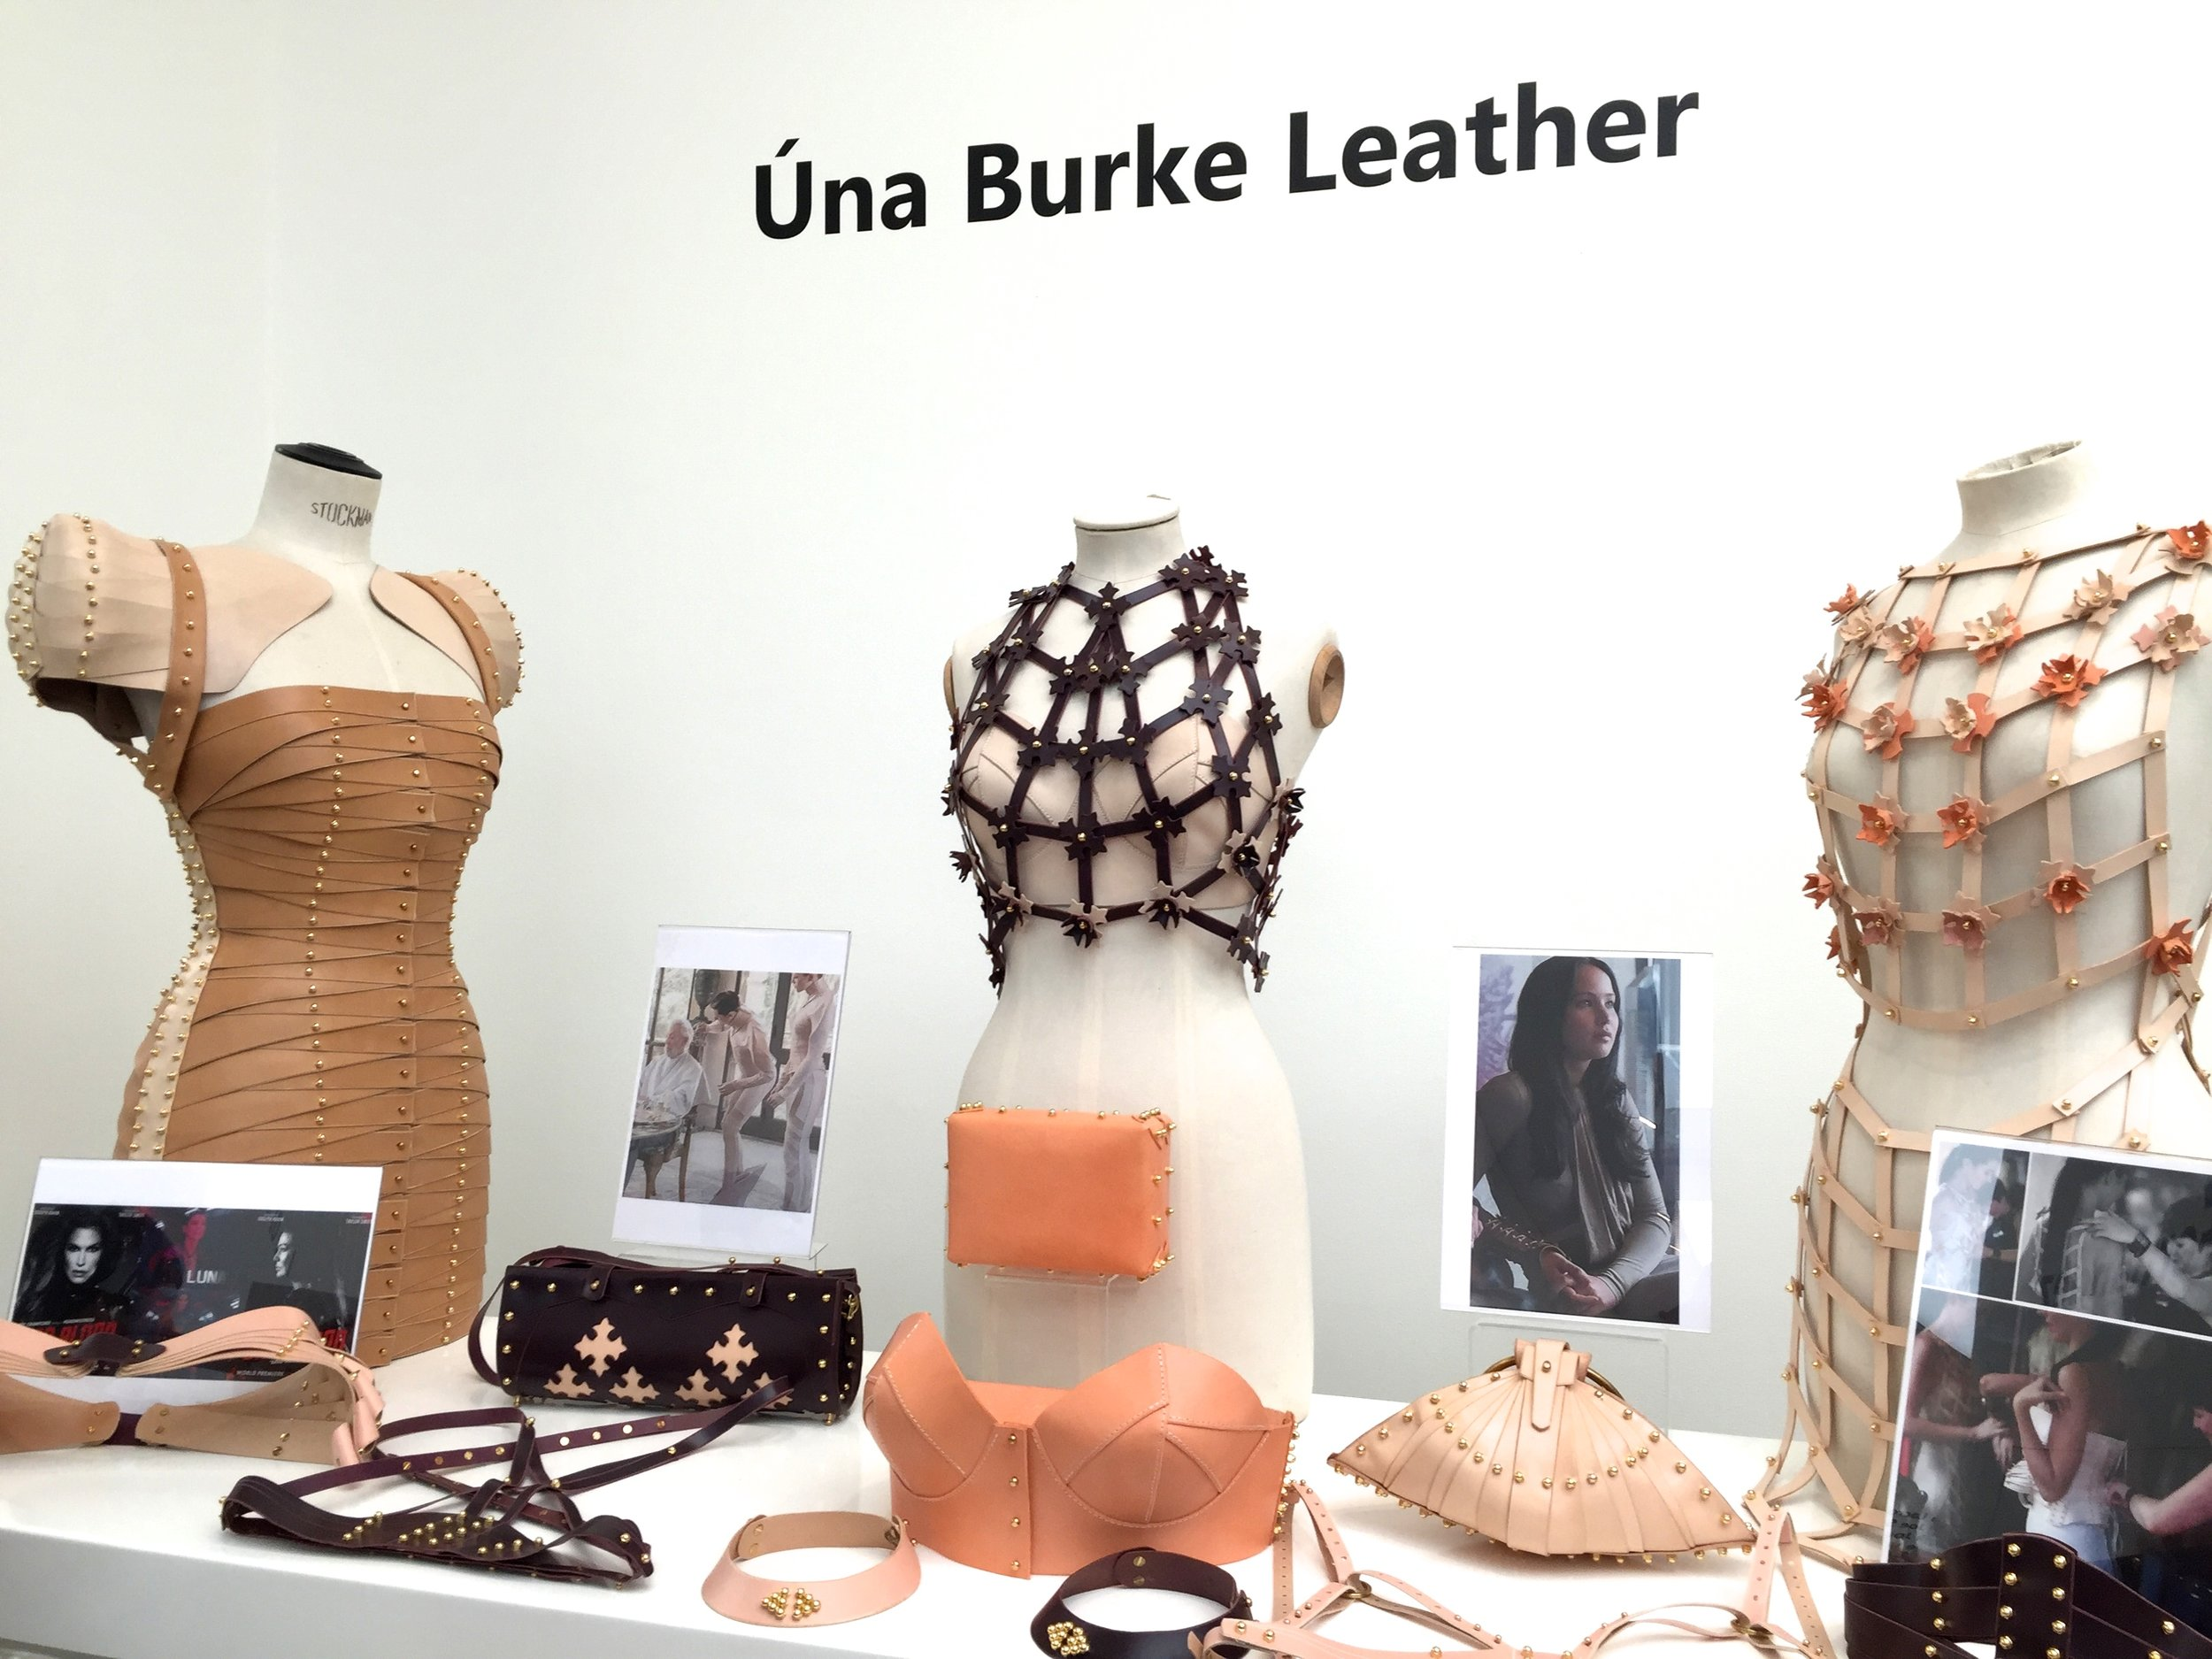 Una Burke Leather